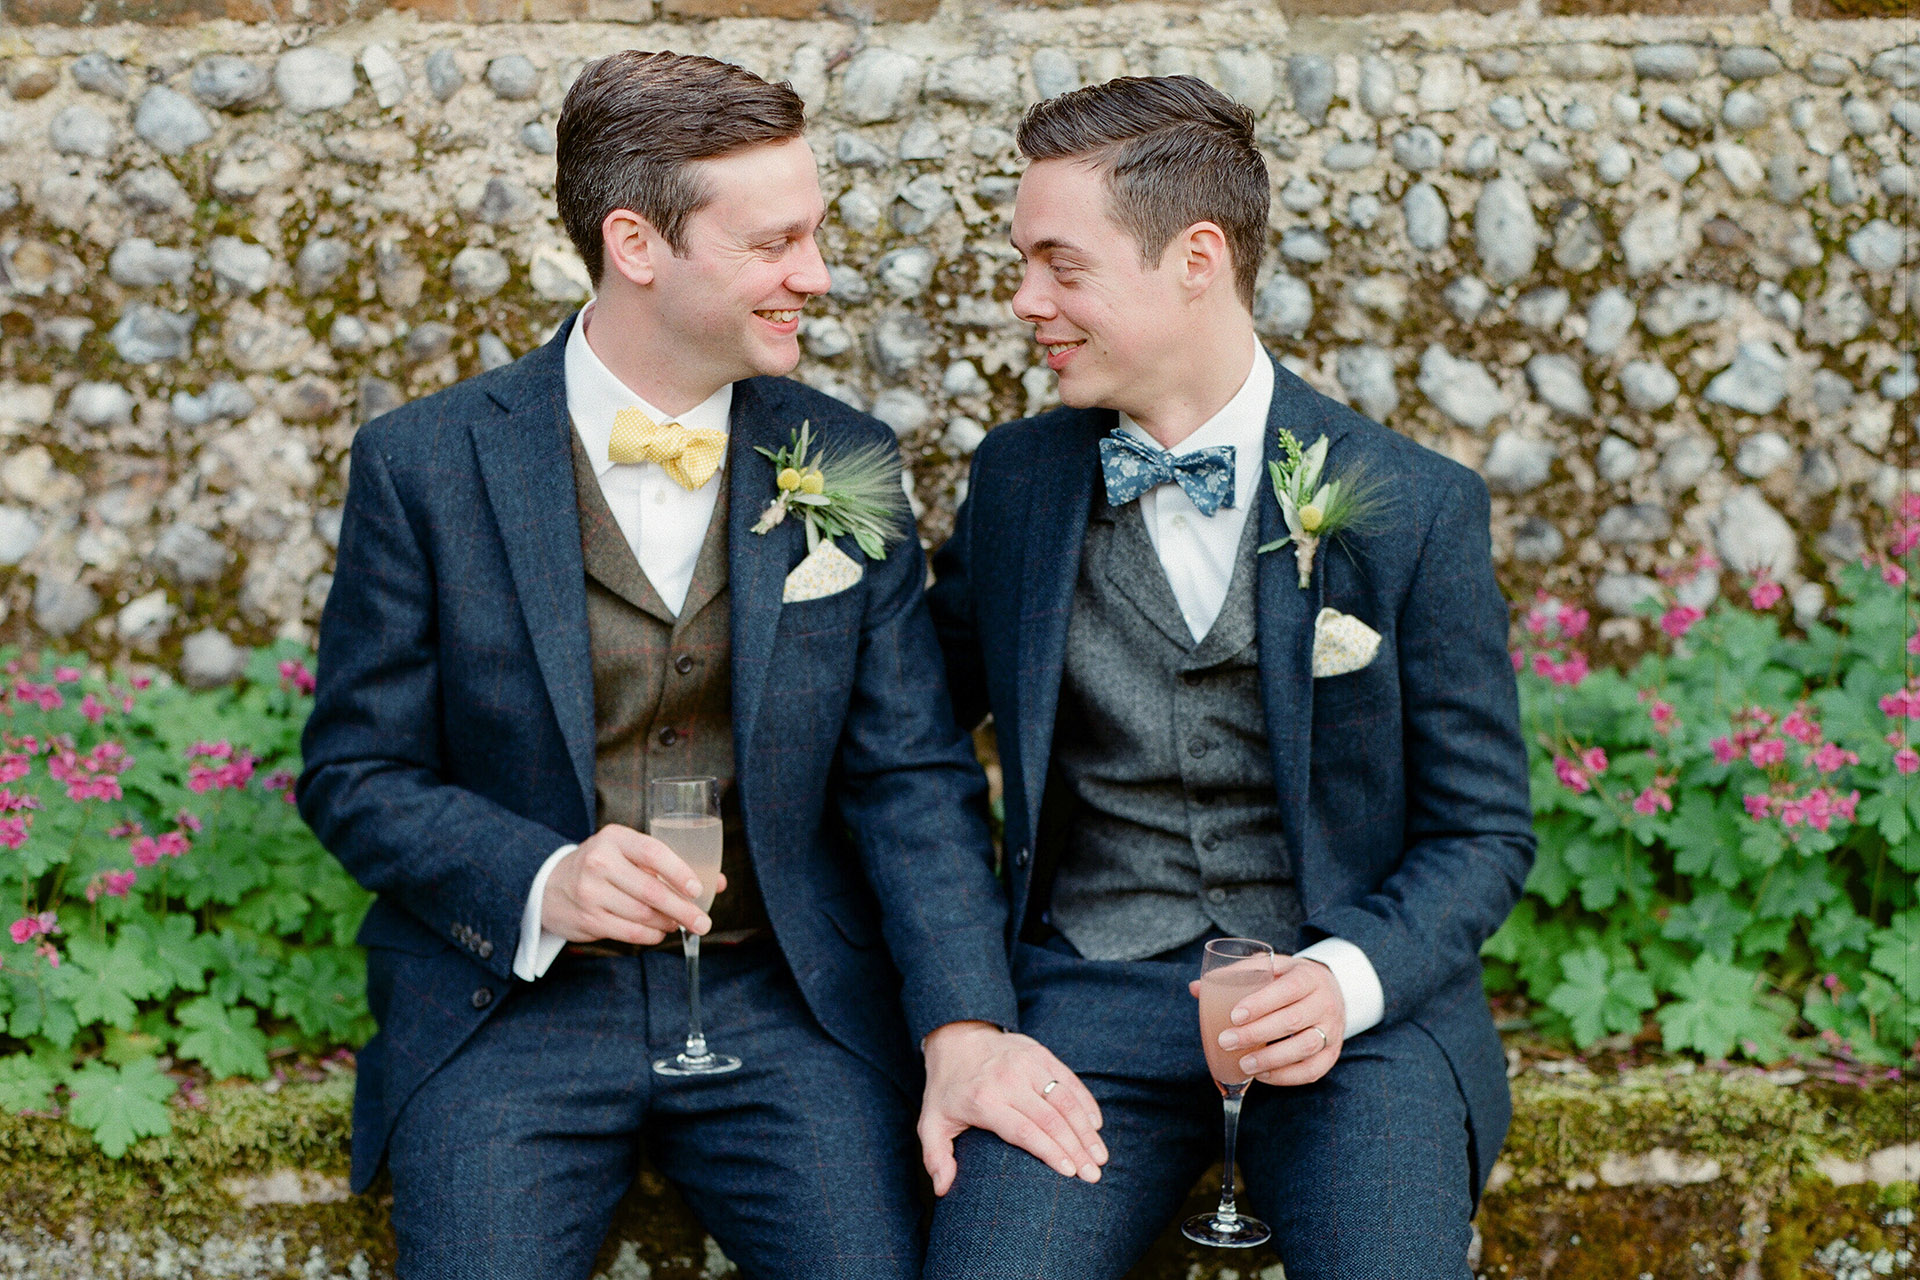 Outdoor Wedding at Voewood in Norfolk - Jamie & Christian